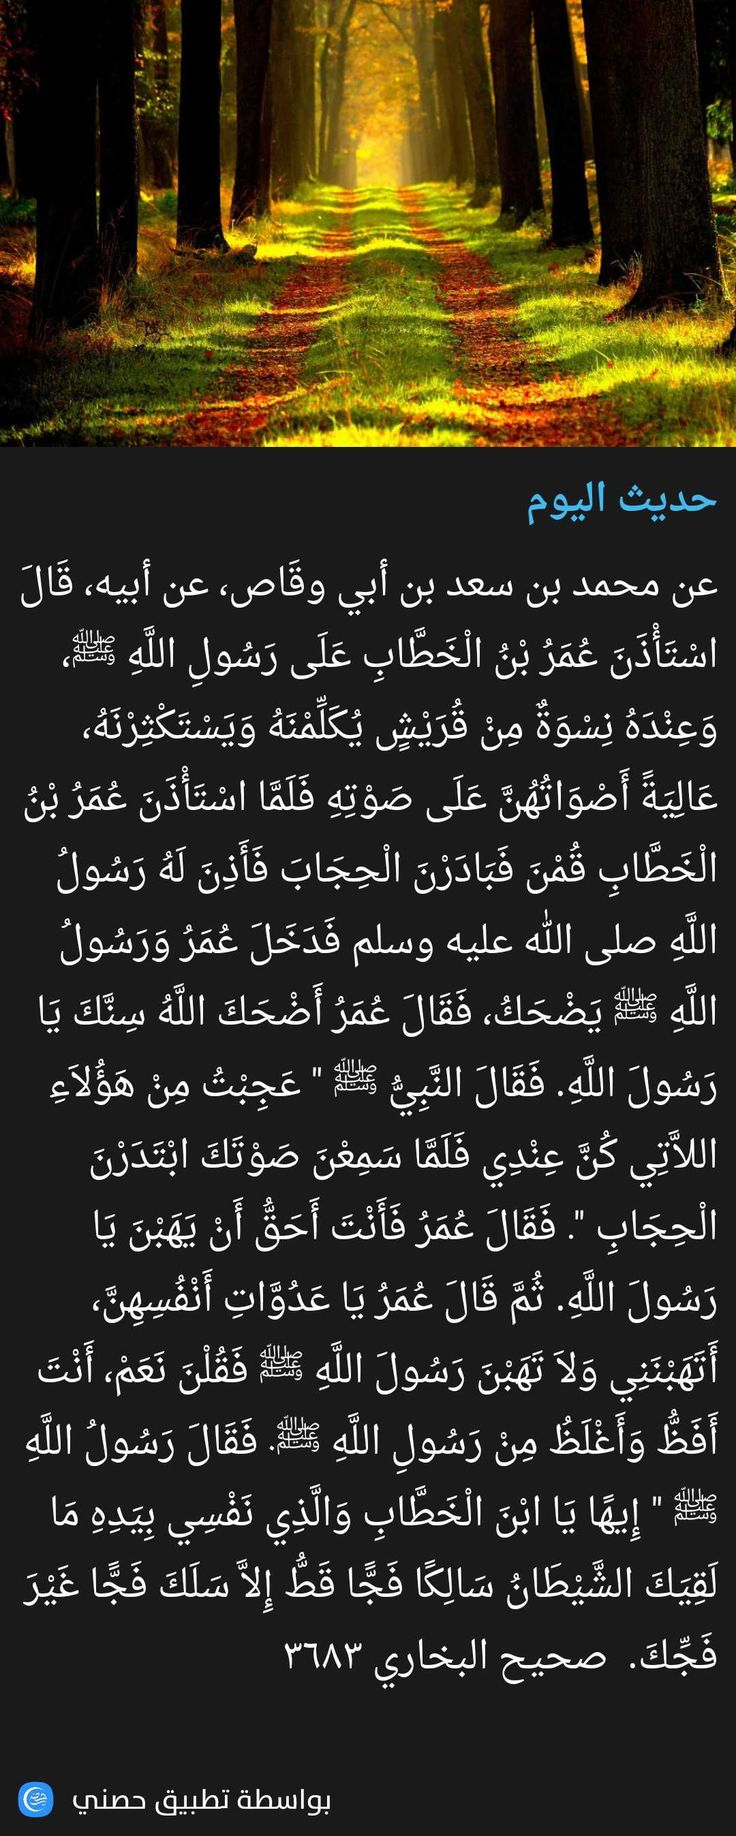 Pin By عبق الورد On أحاديث نبوية ٢ Peace Be Upon Him Islam Peace